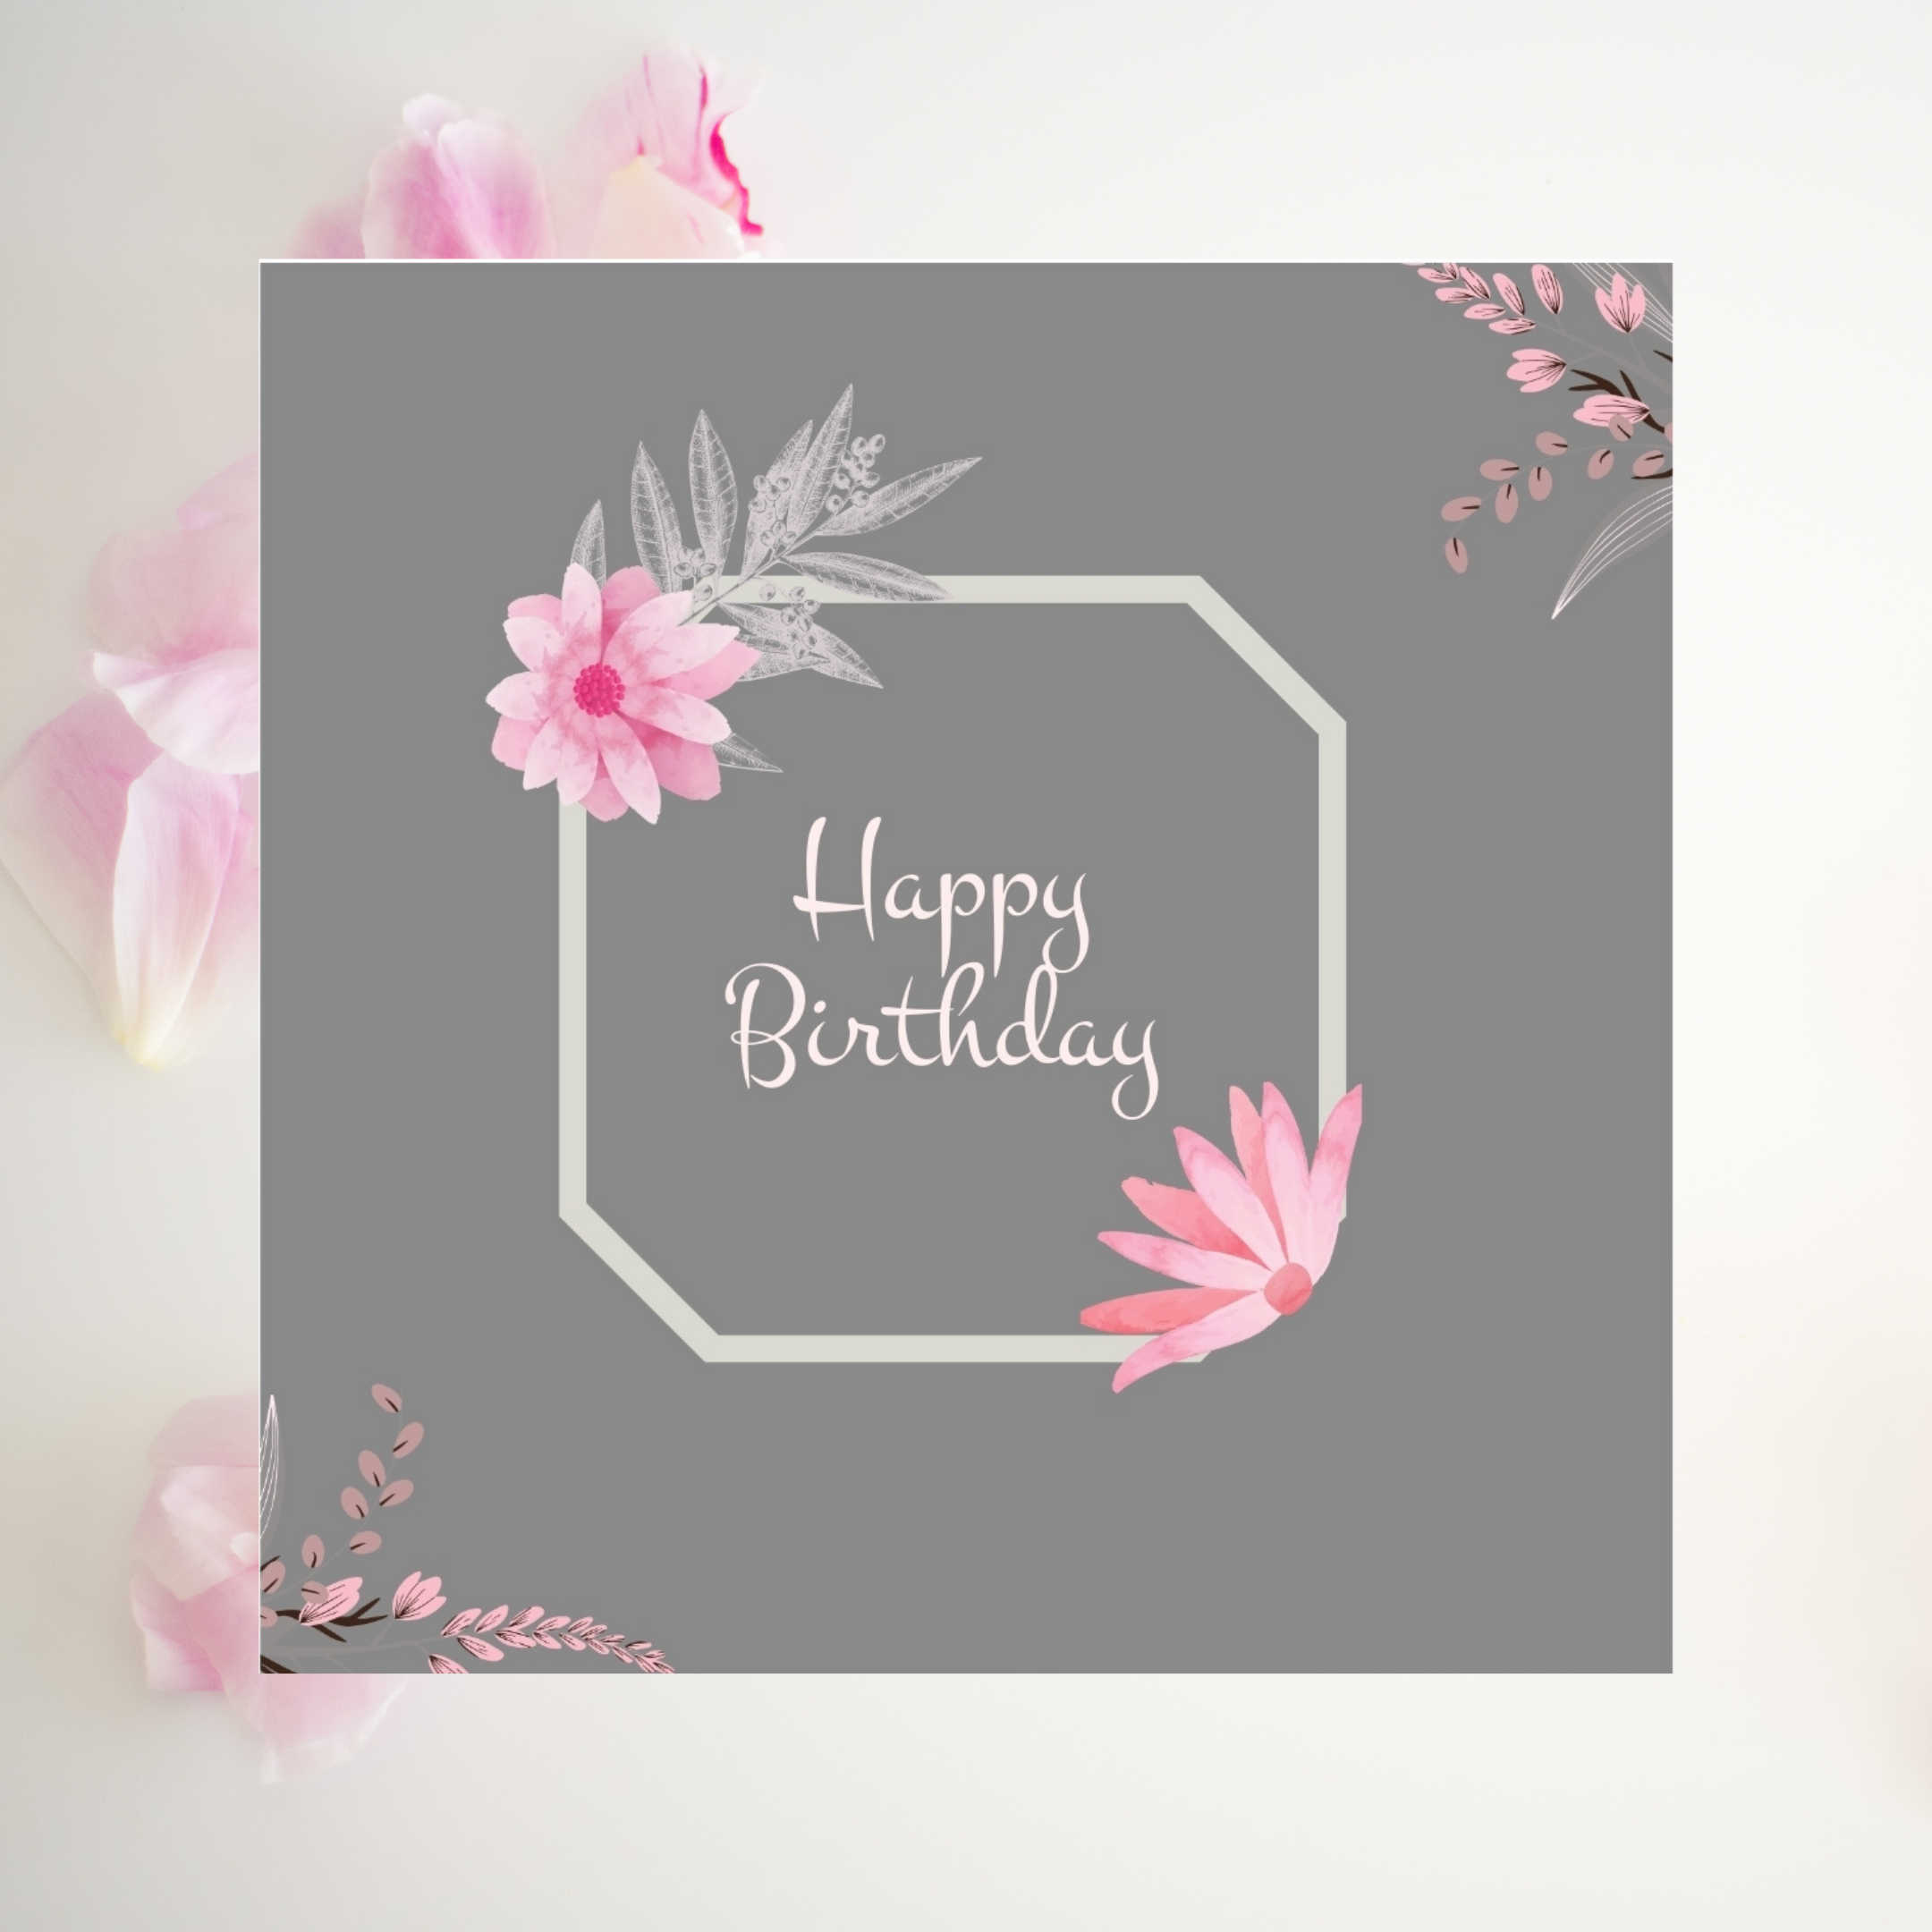 Flower Birthday Card Pretty Card Plant Happy Birthday Card Printable Digital Editable Freedemo Flower Birthday Cards Happy Birthday Cards Birthday Cards